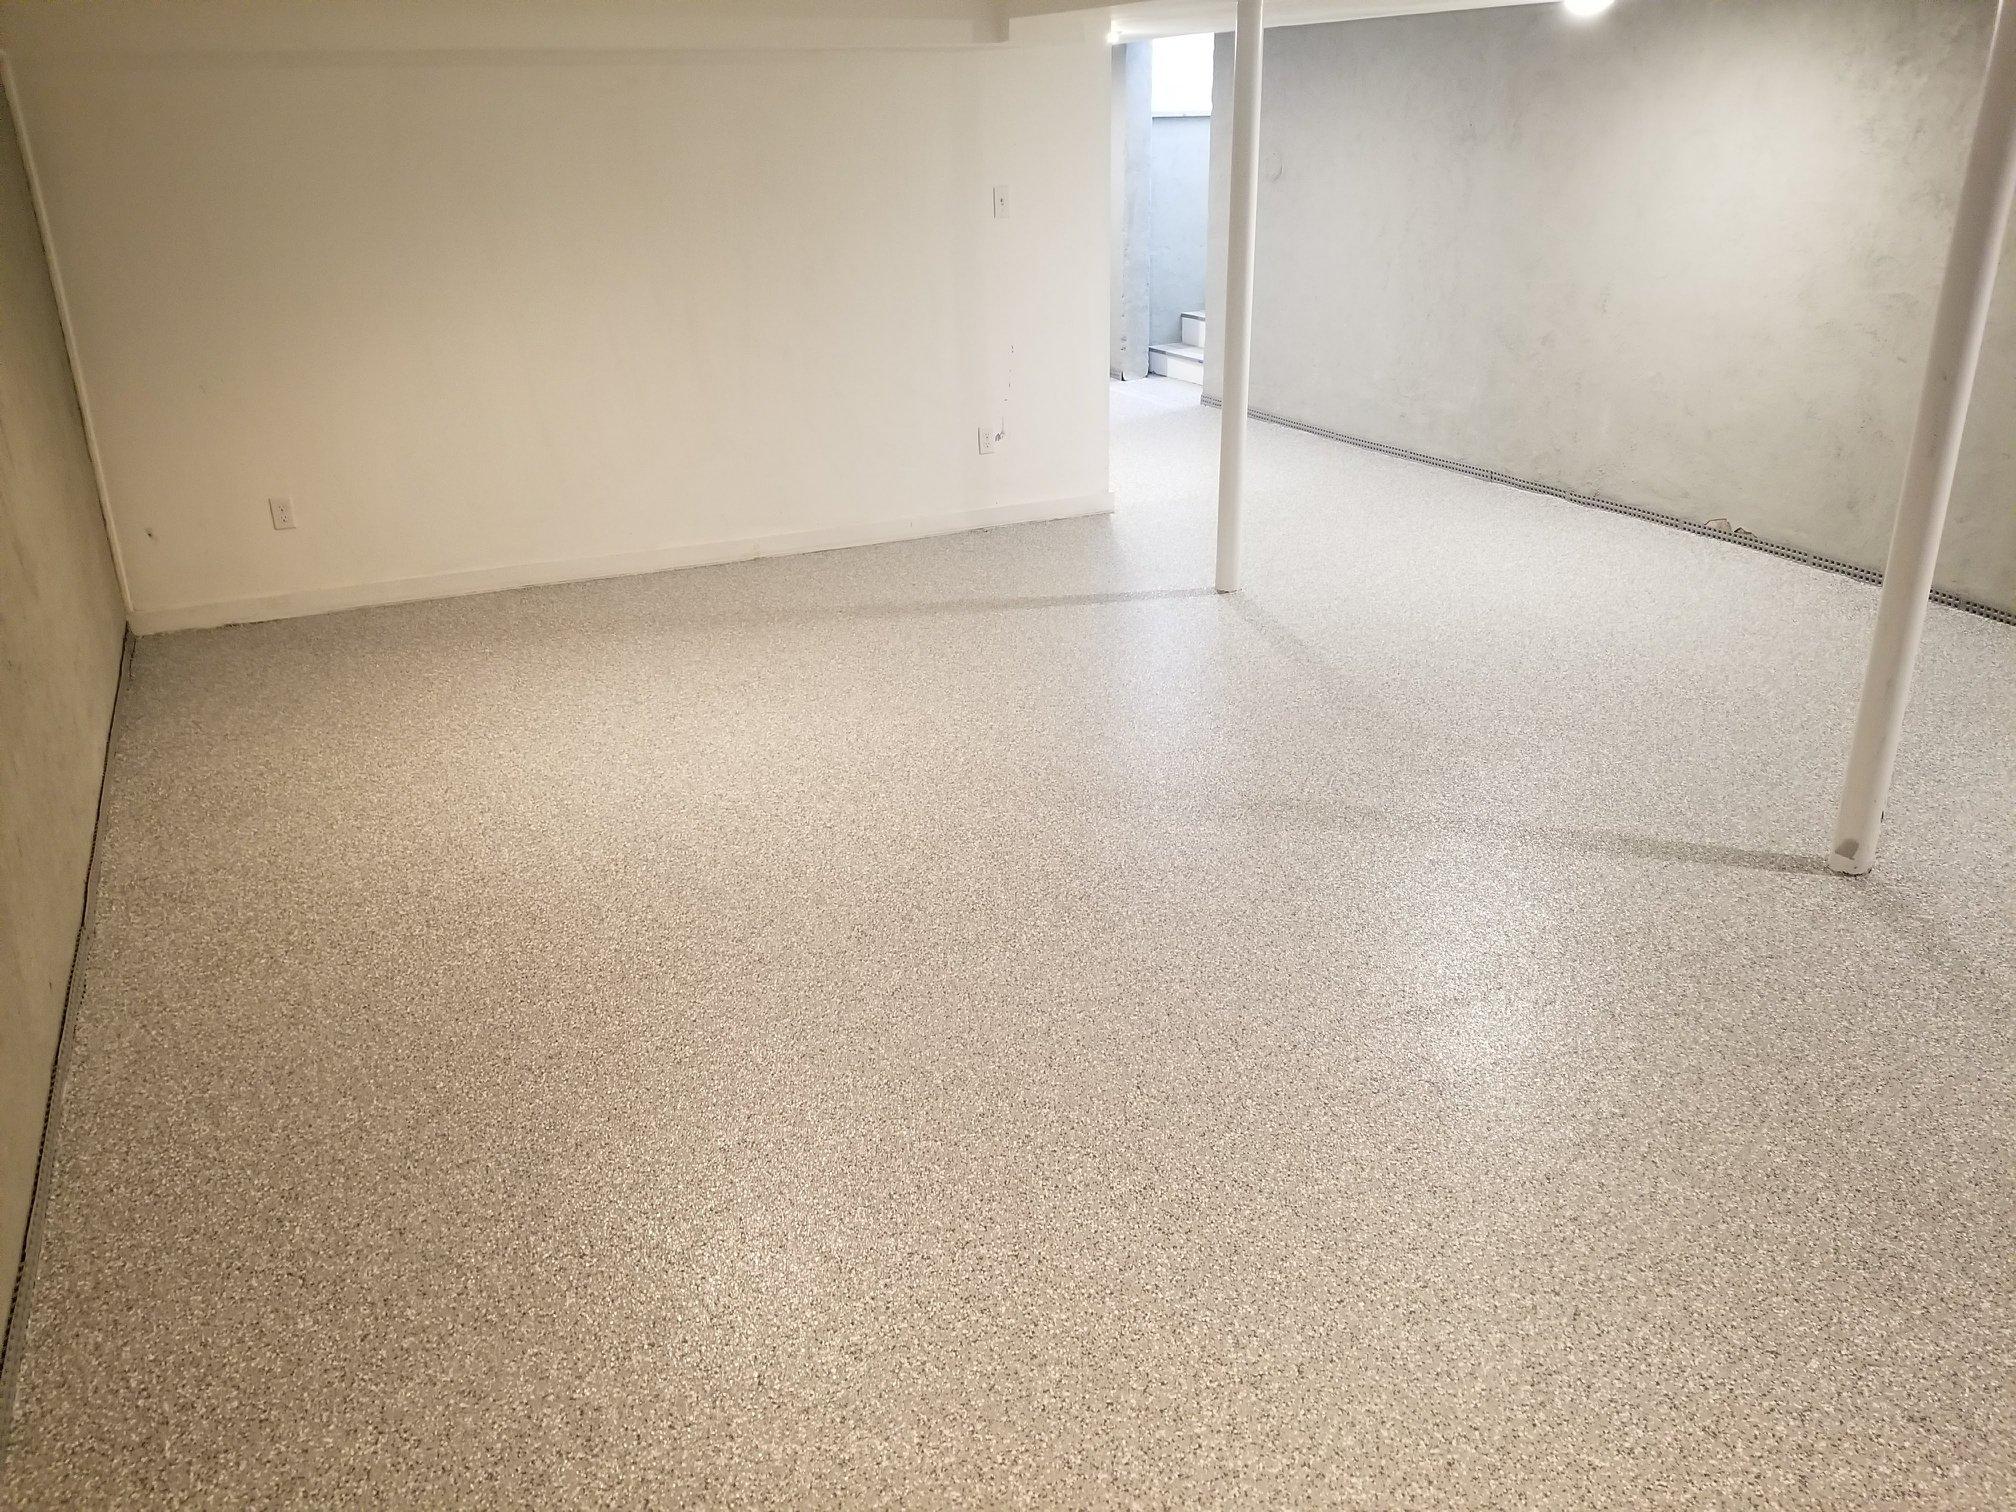 concrete floor coatings nj